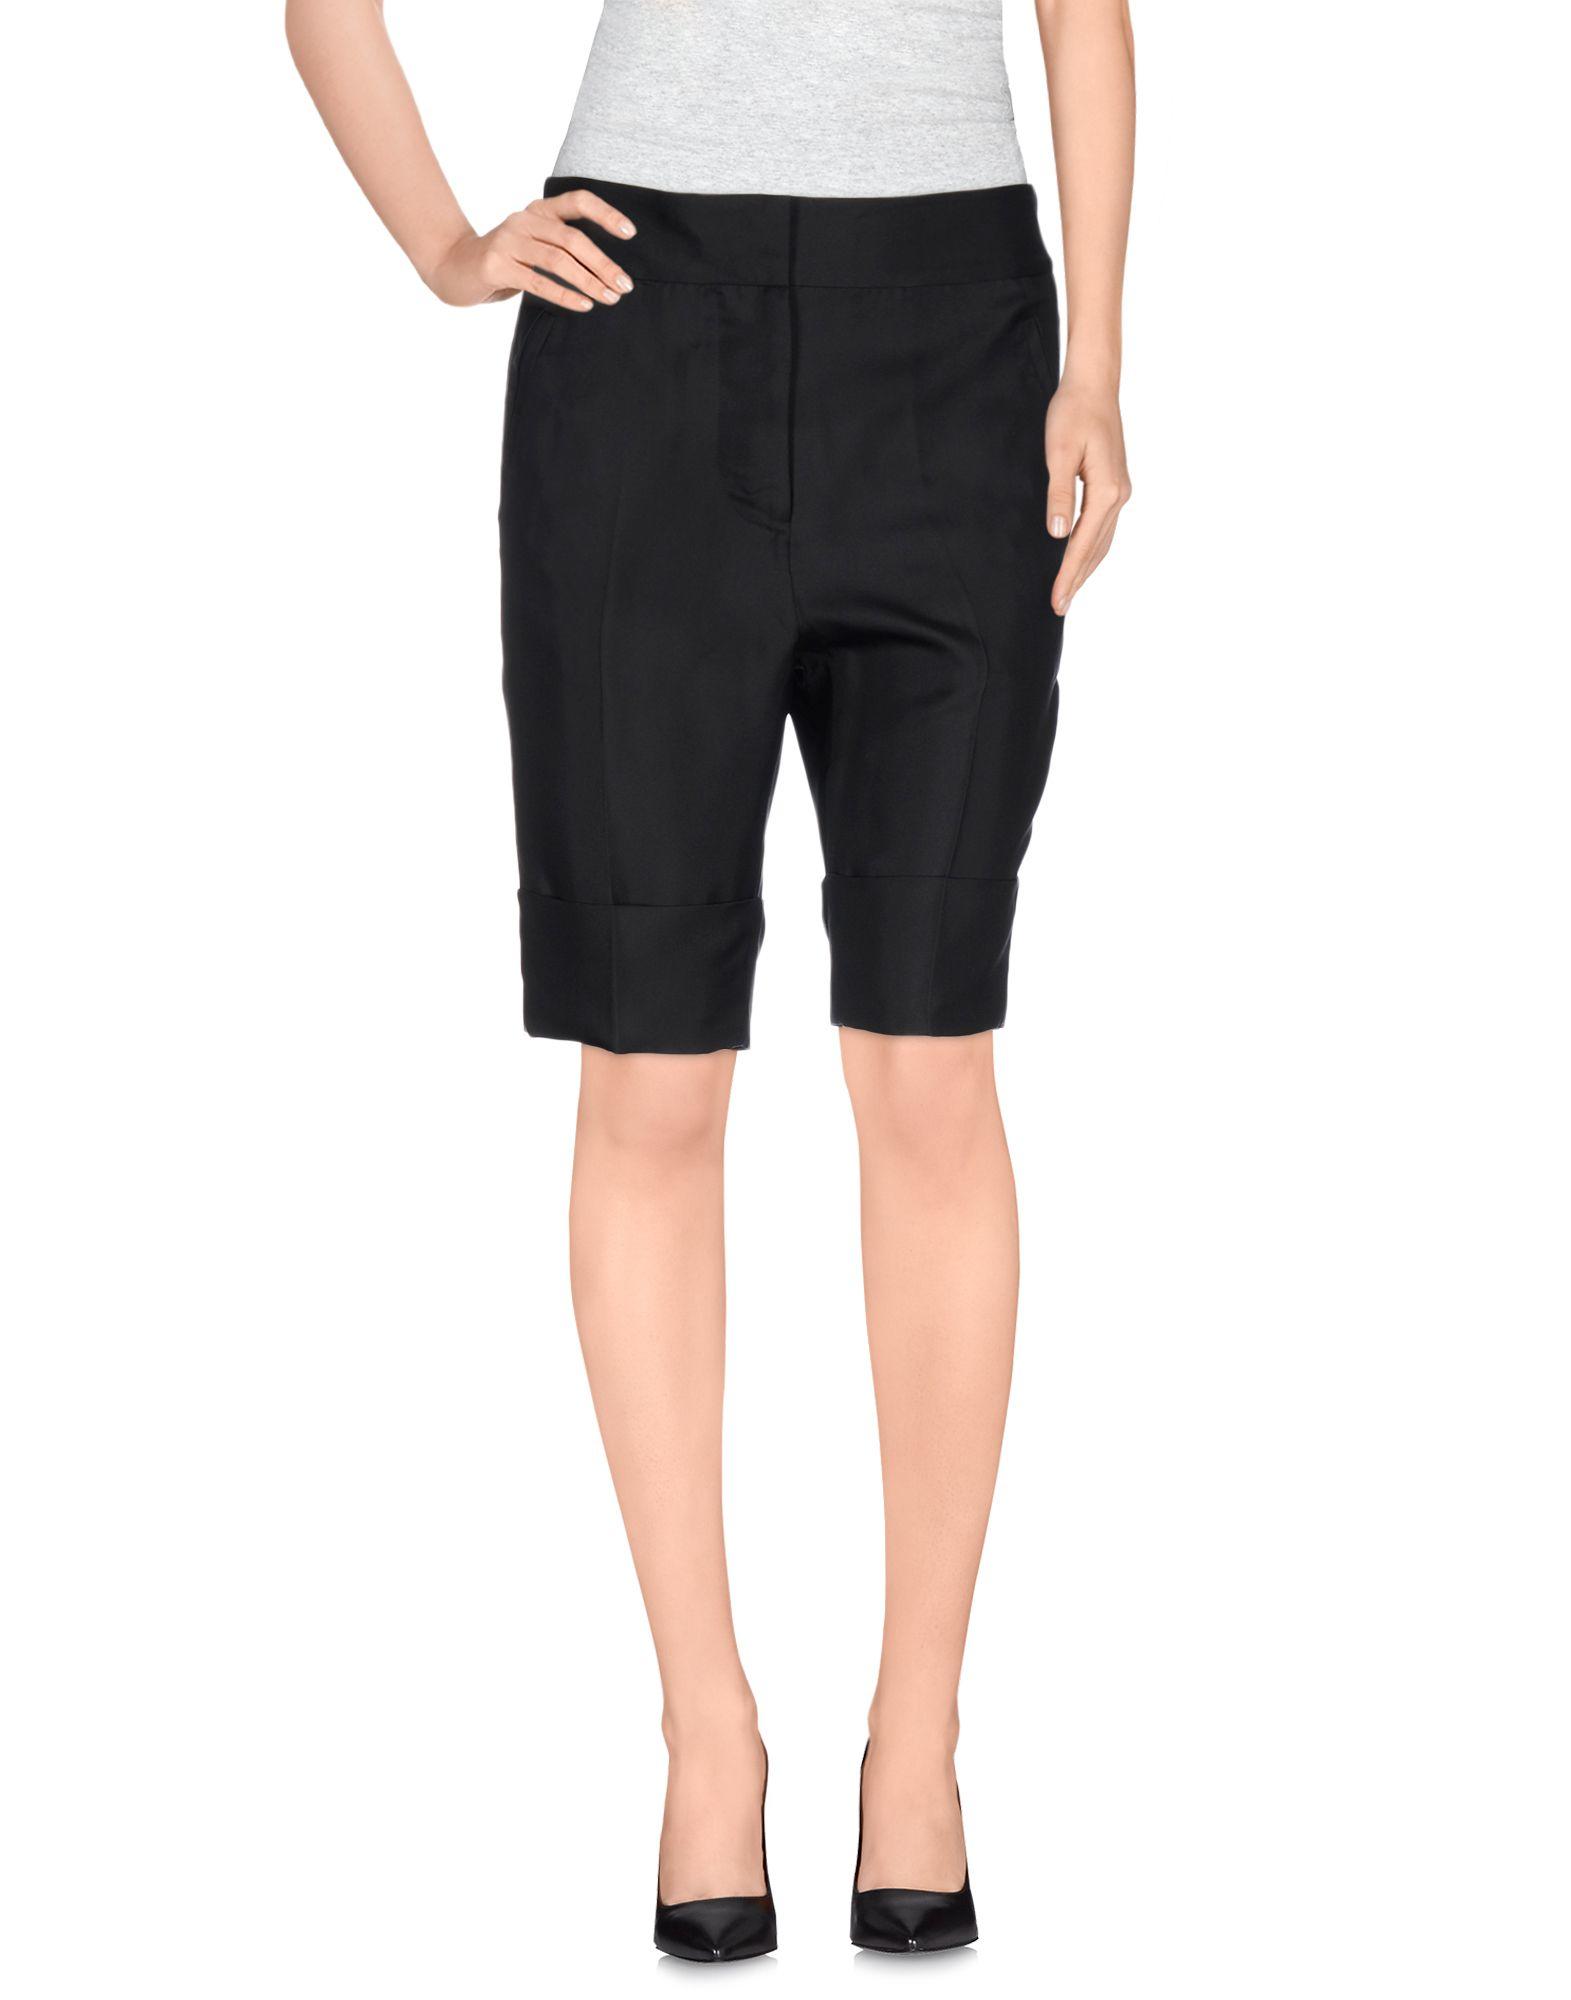 Lyst - Acne Studios Bermuda Shorts in Black